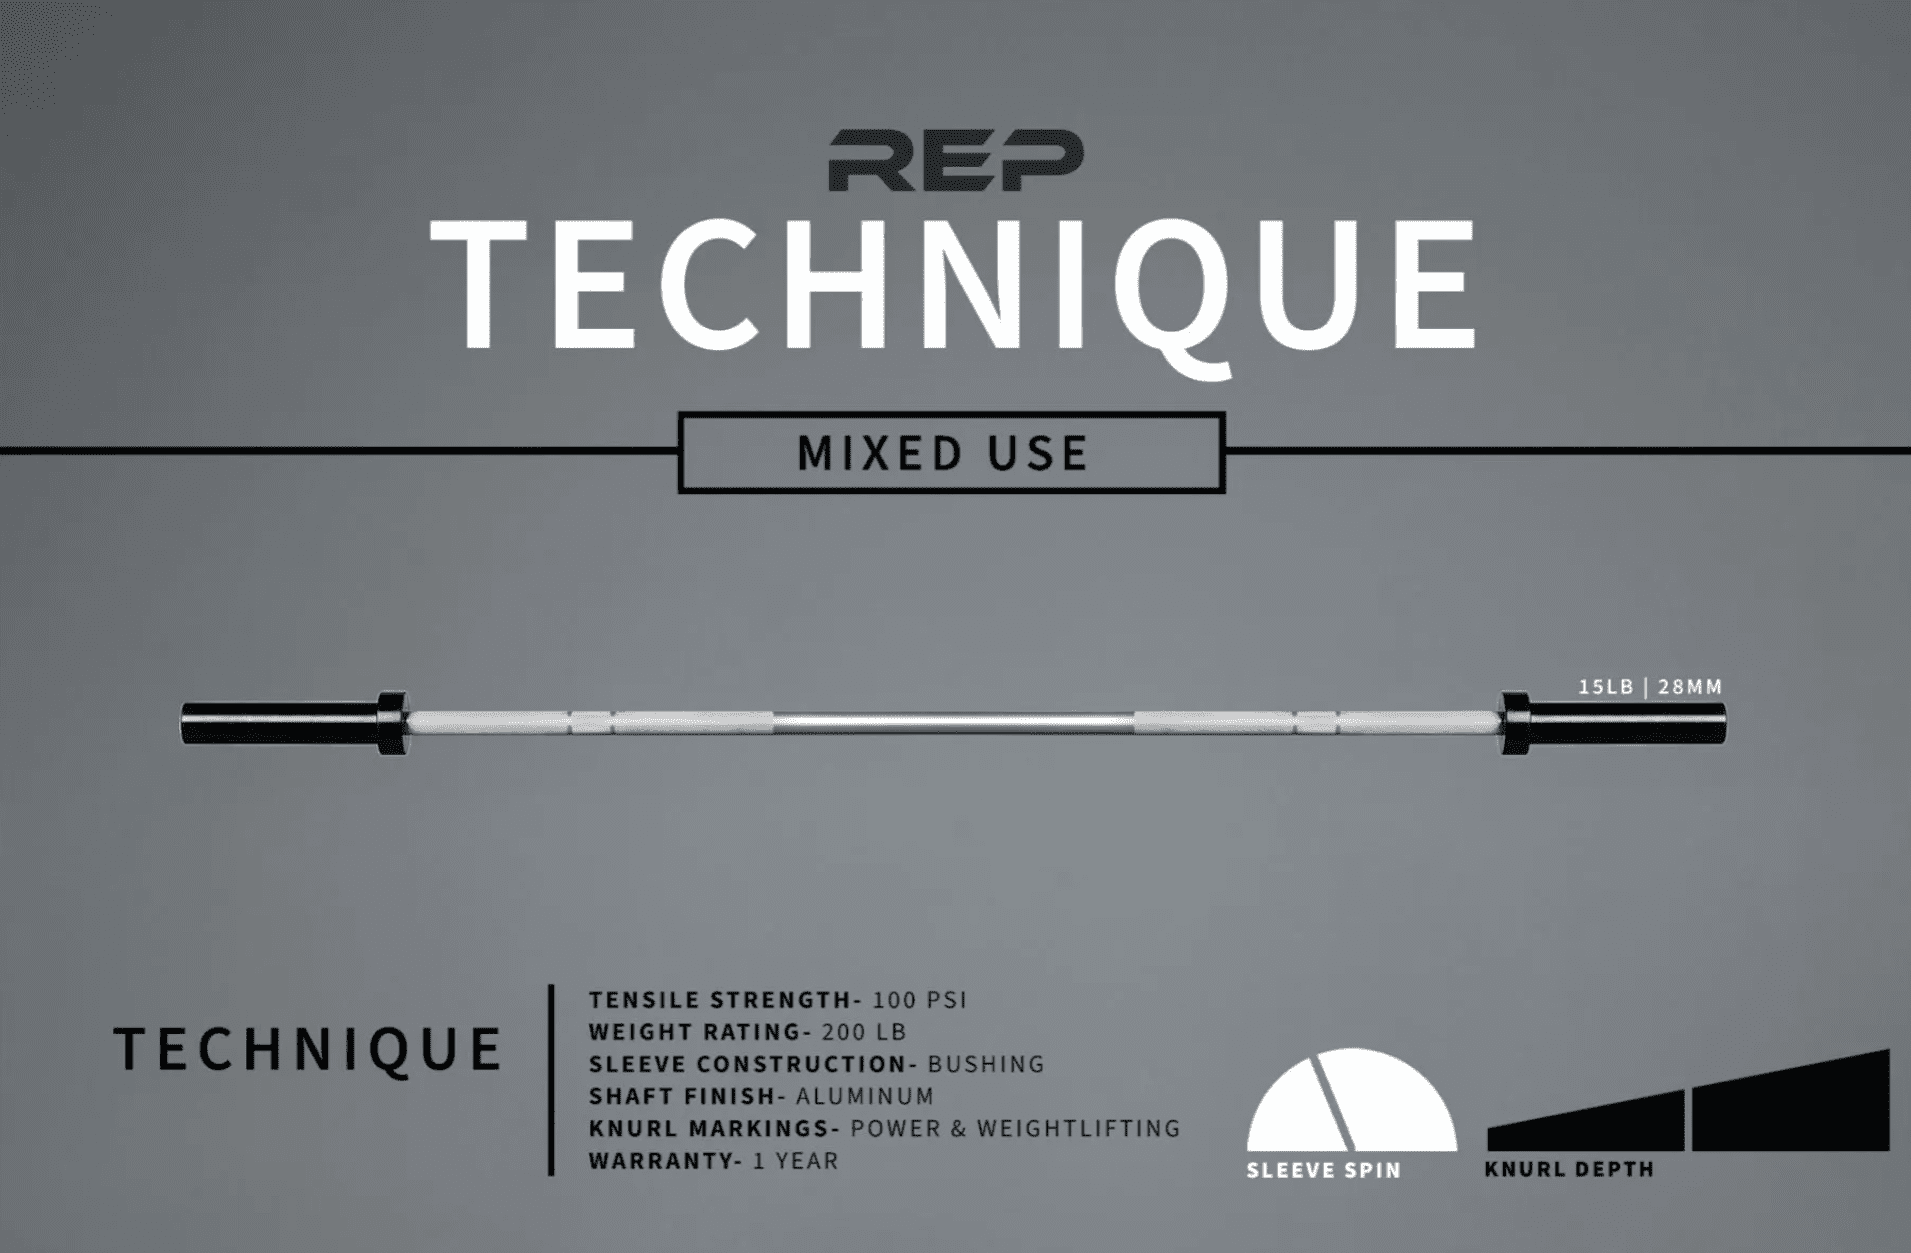 REP Technique Bar